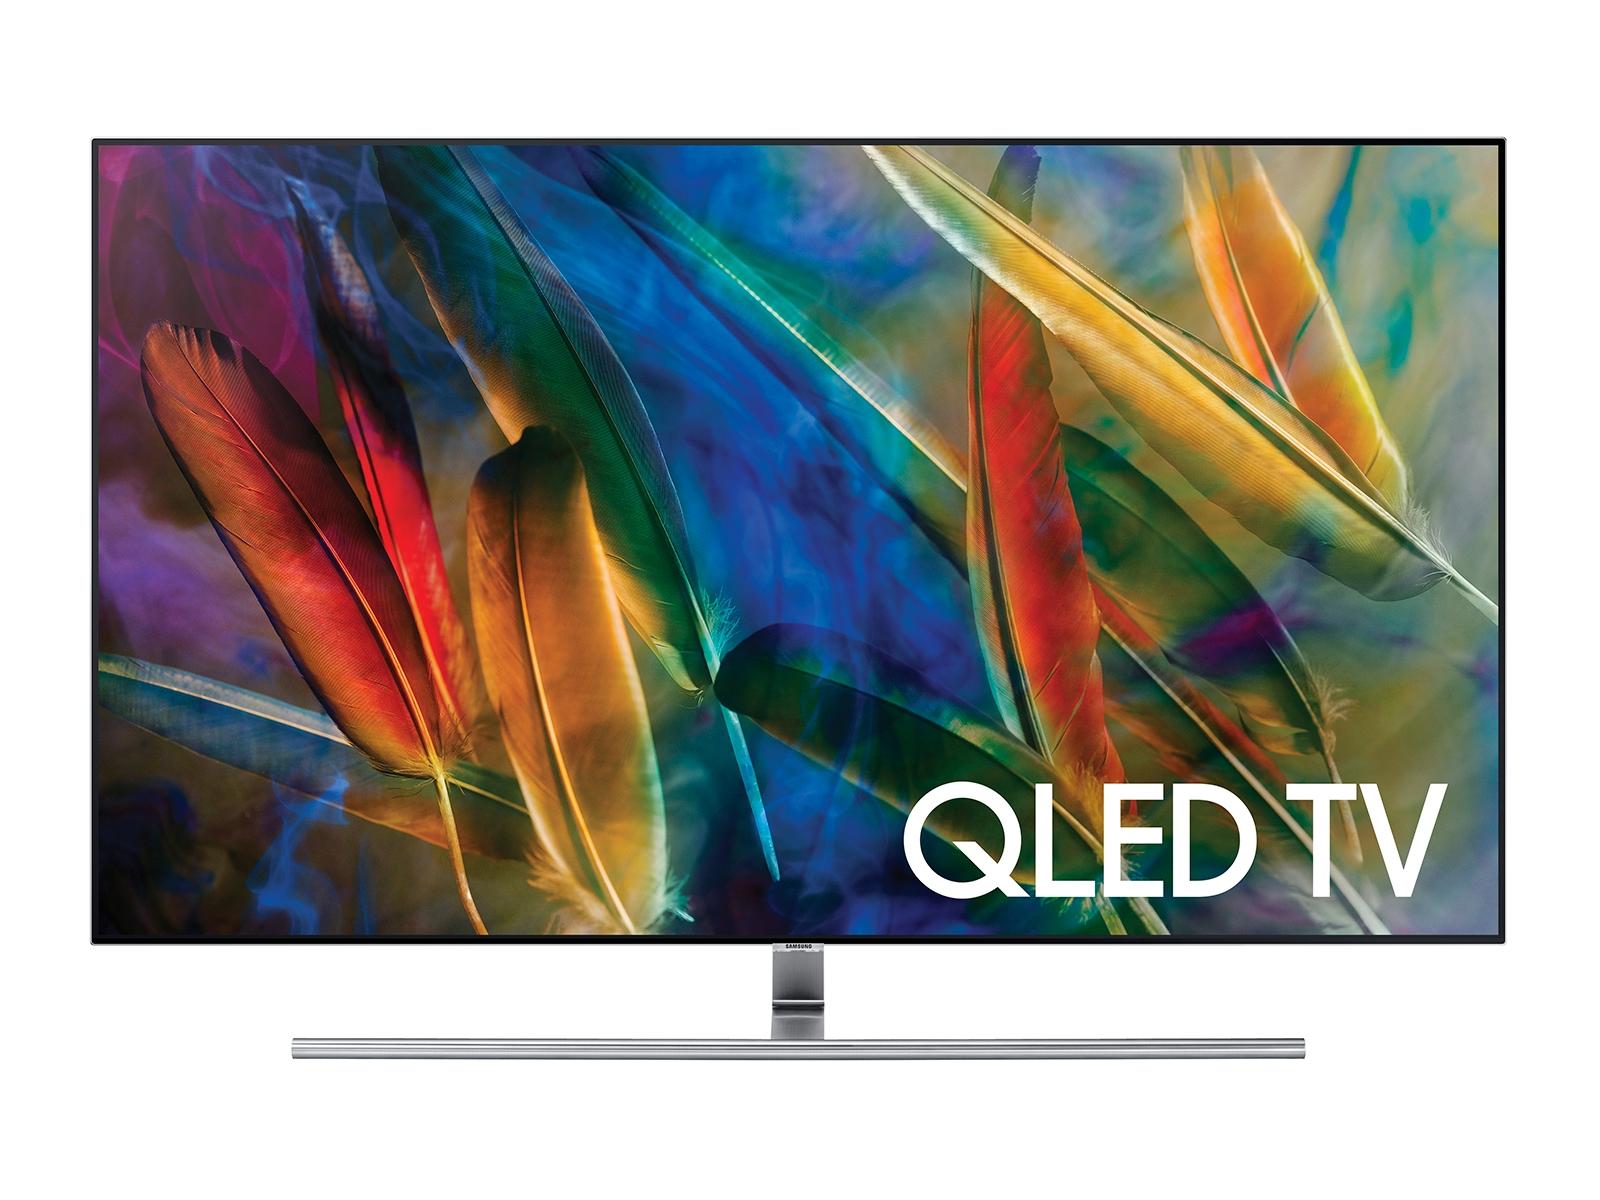 55 Samsung Tv Wiring Diagram Smart Electrical Class Q7f Qled 4k Tvs Qn55q7famfxza Usrhsamsung